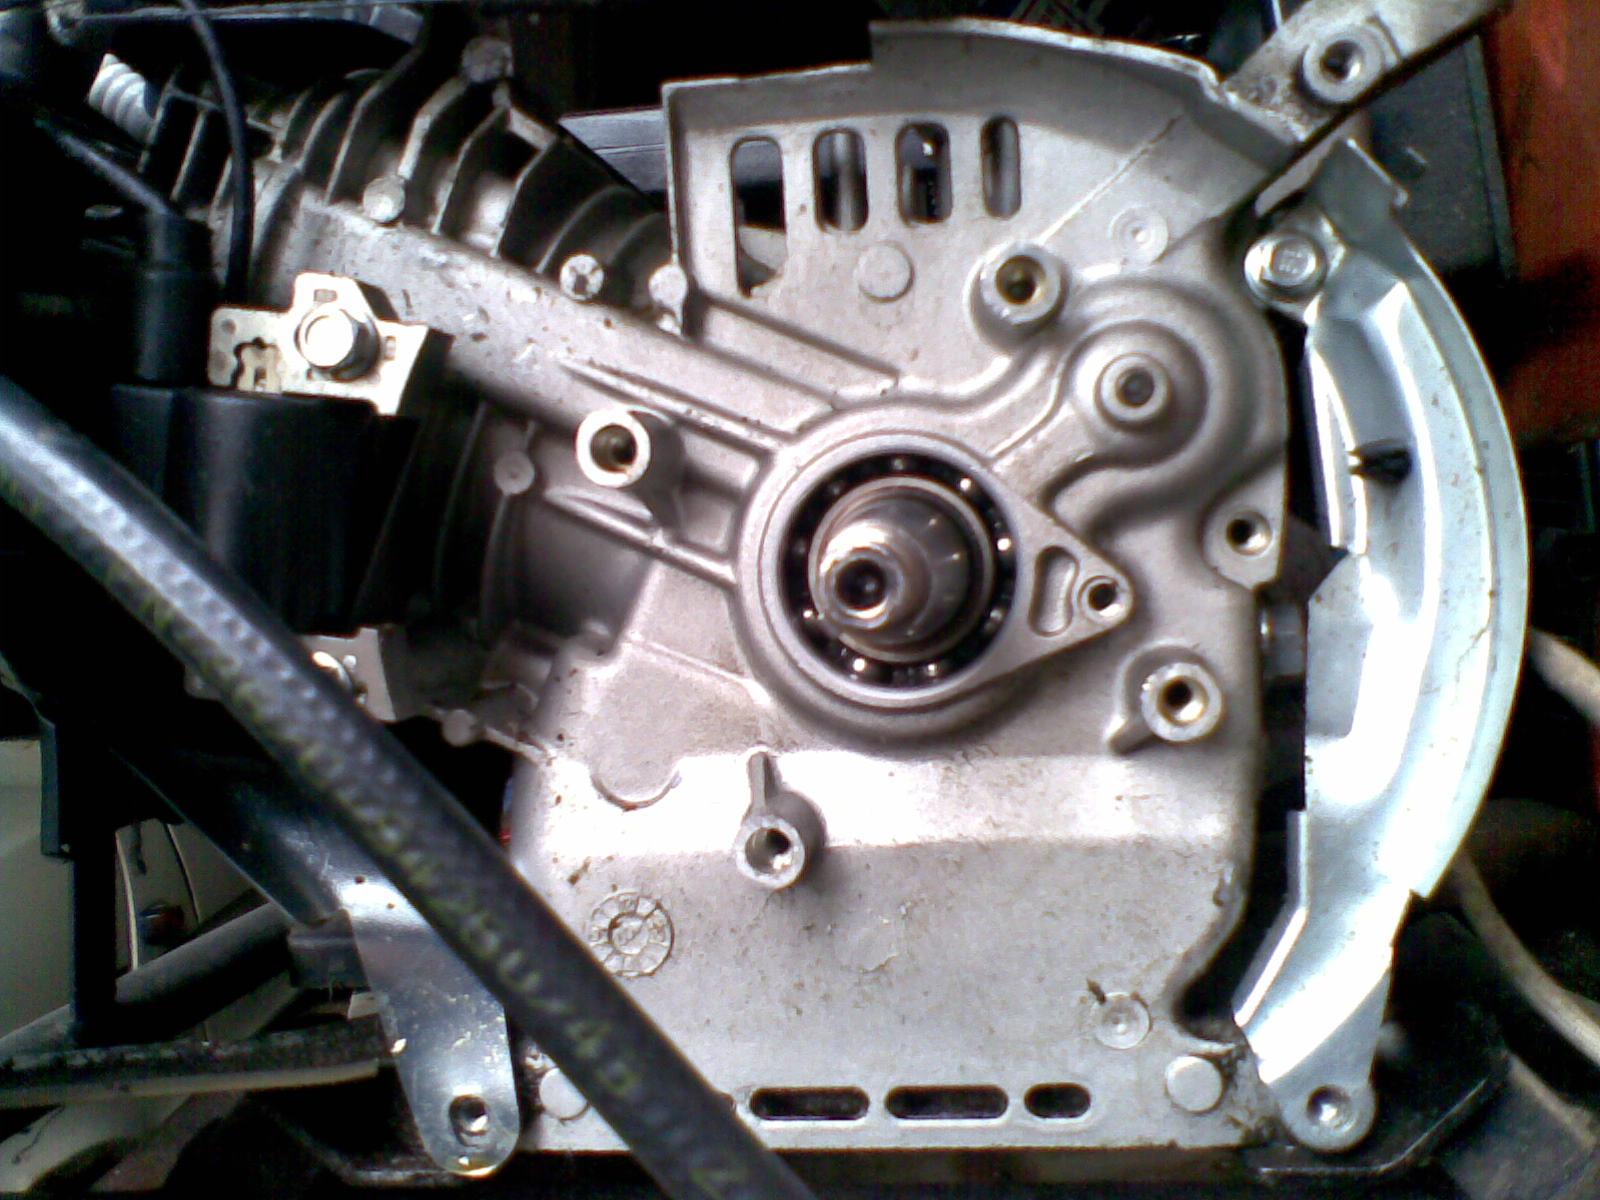 Silnik agregatu Einhell 2500/1 pyta� kilka